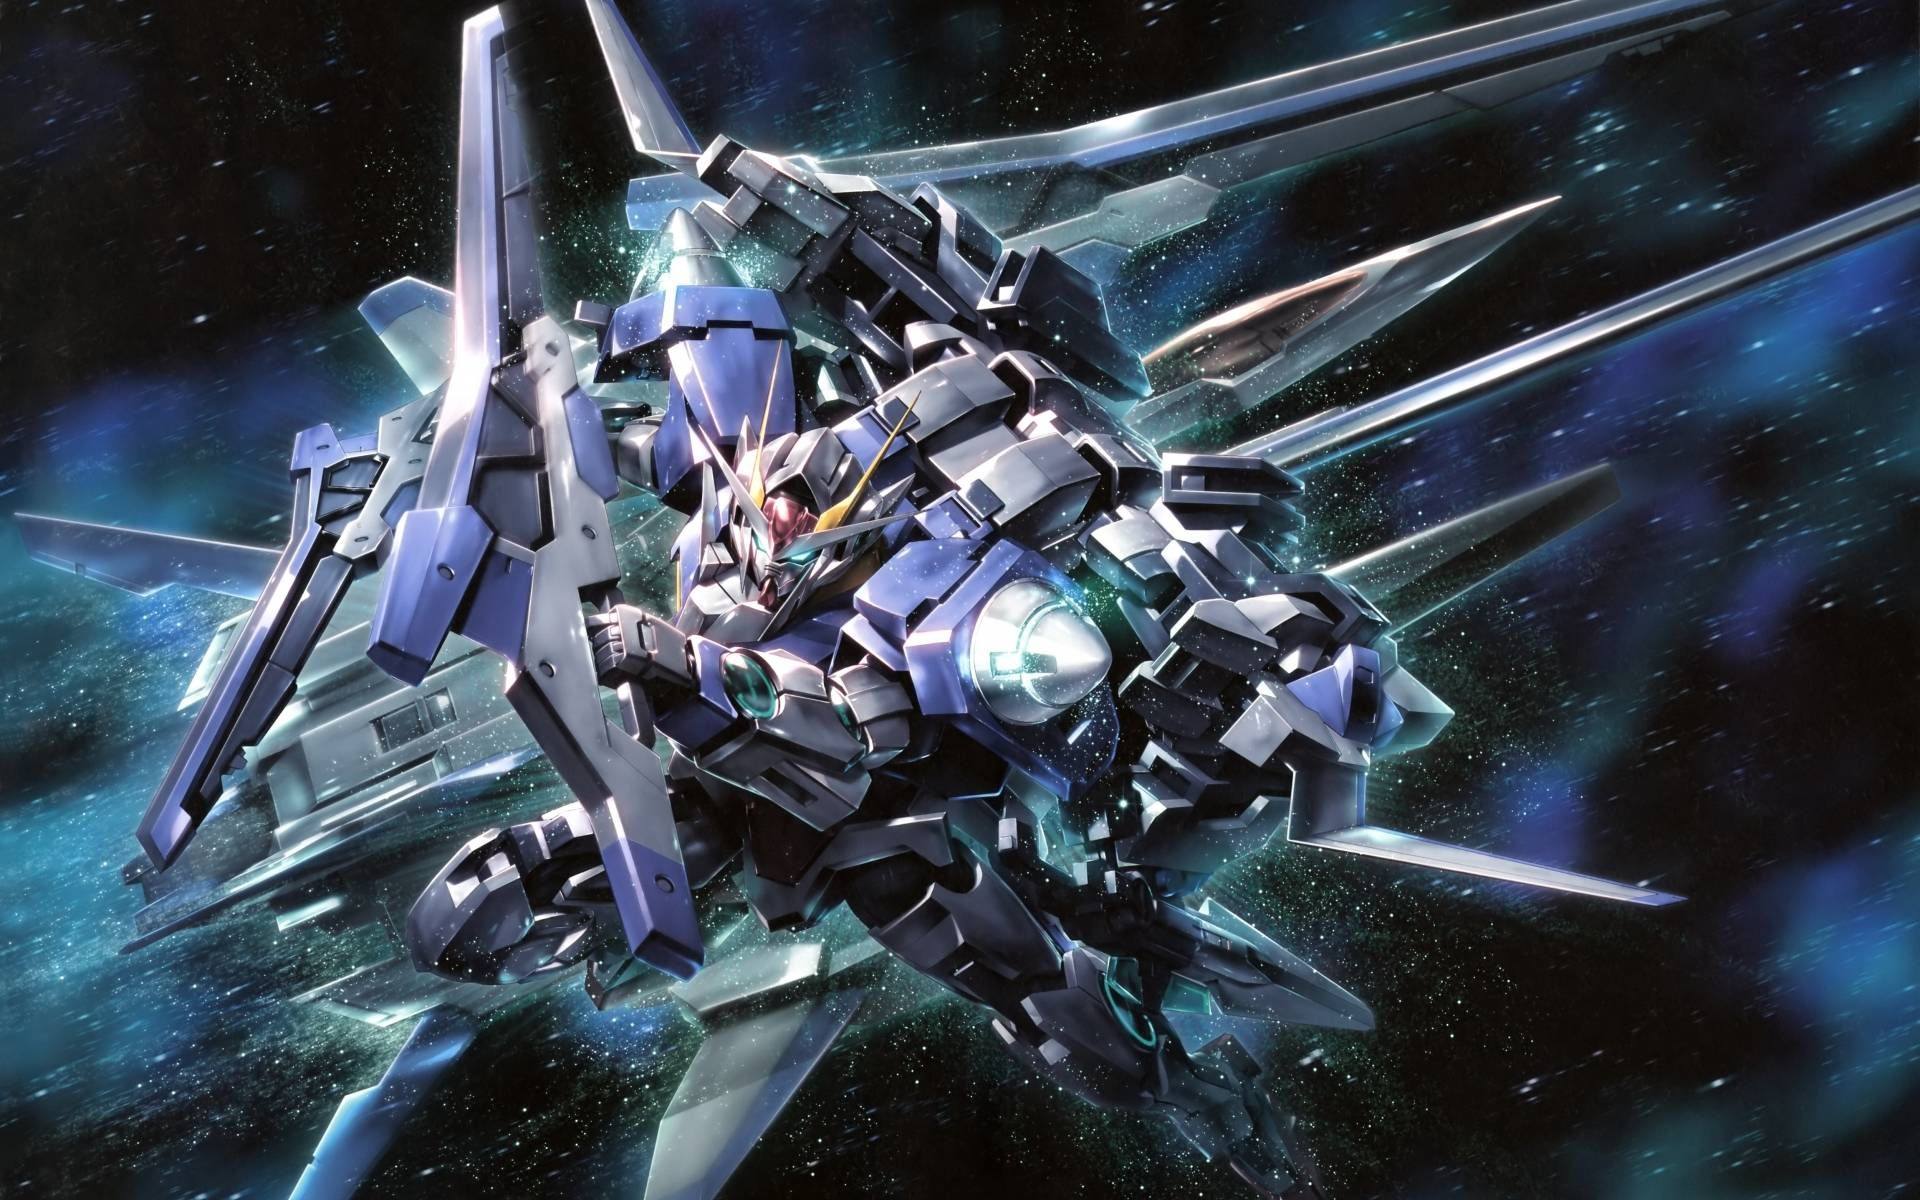 Gundam 00 Wallpapers Full Hd Wallpaper Search ガンダム